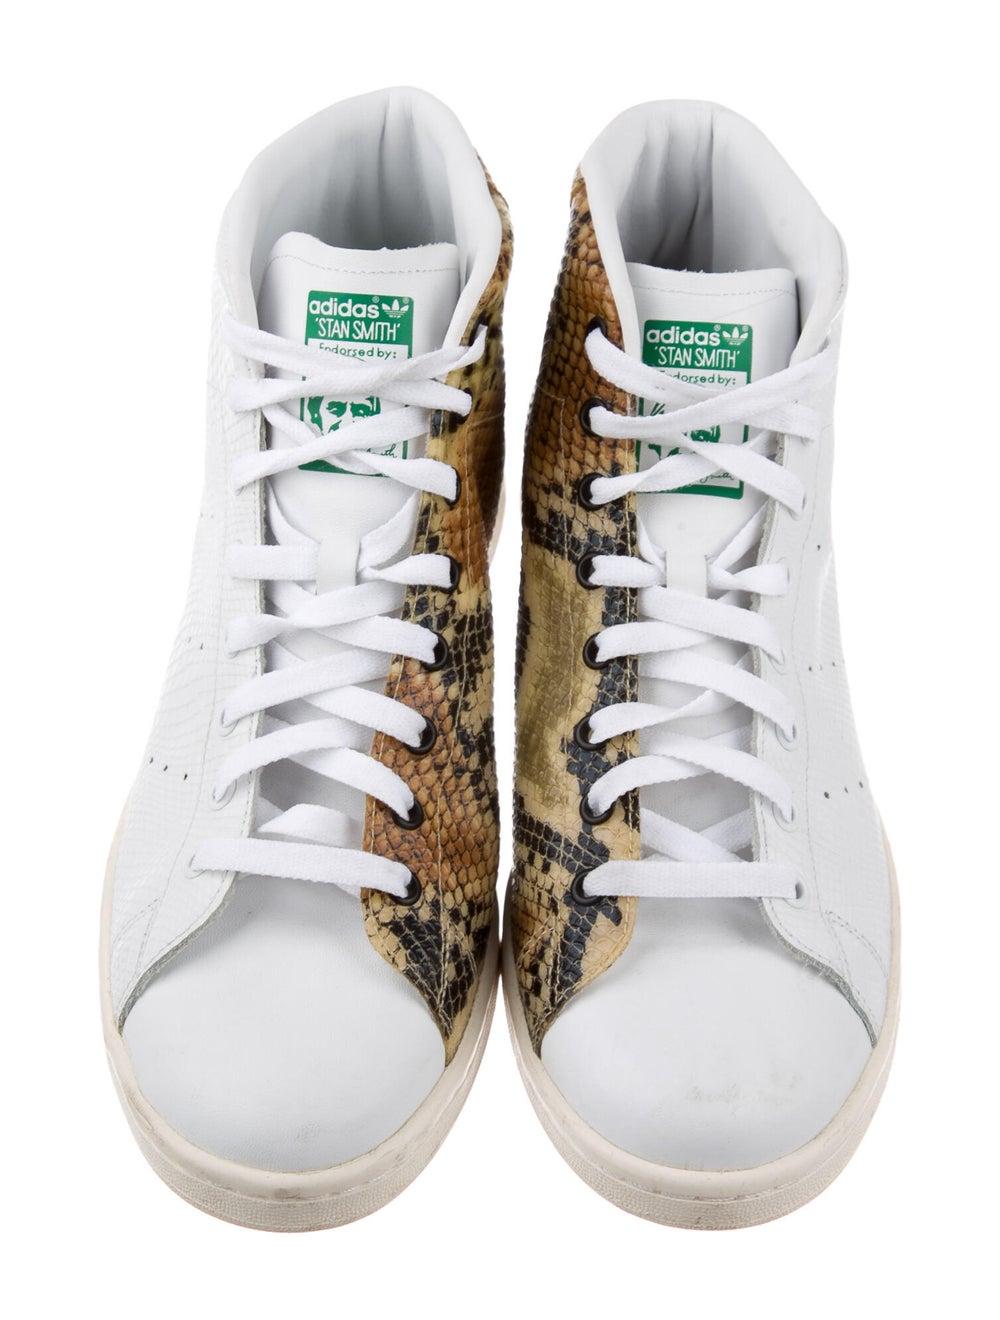 Adidas Stan Smith Mid Sneakers White - image 3